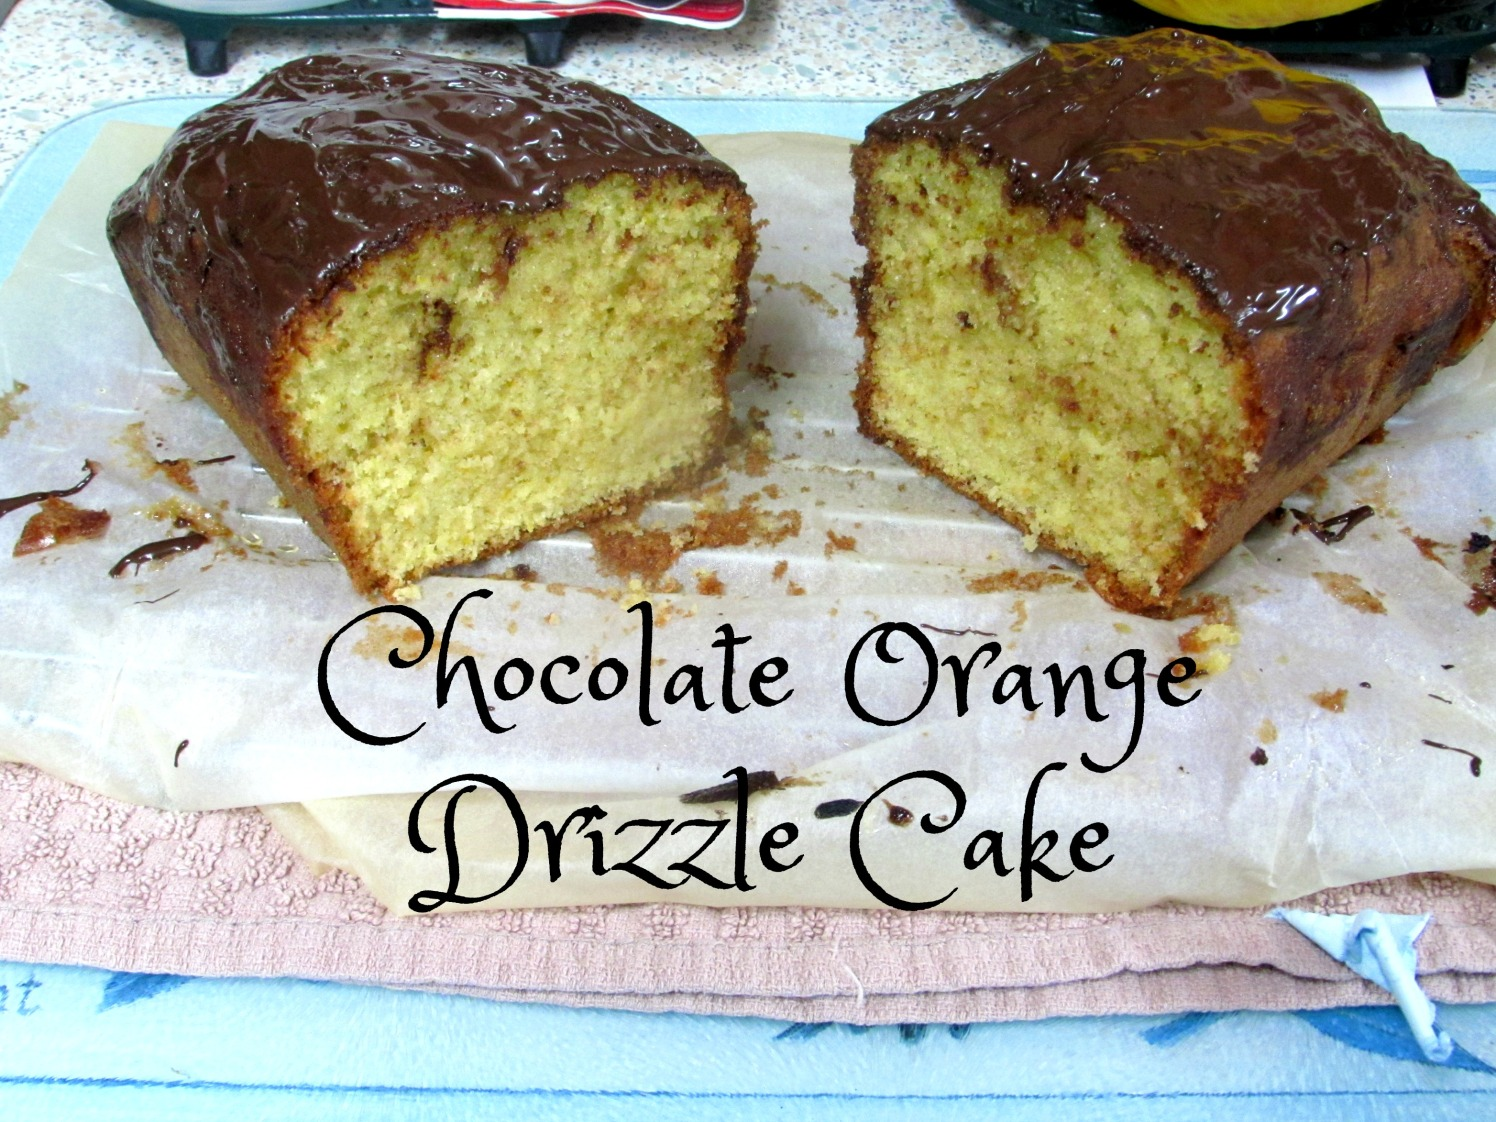 Chocolate Orange Drizzle Cake